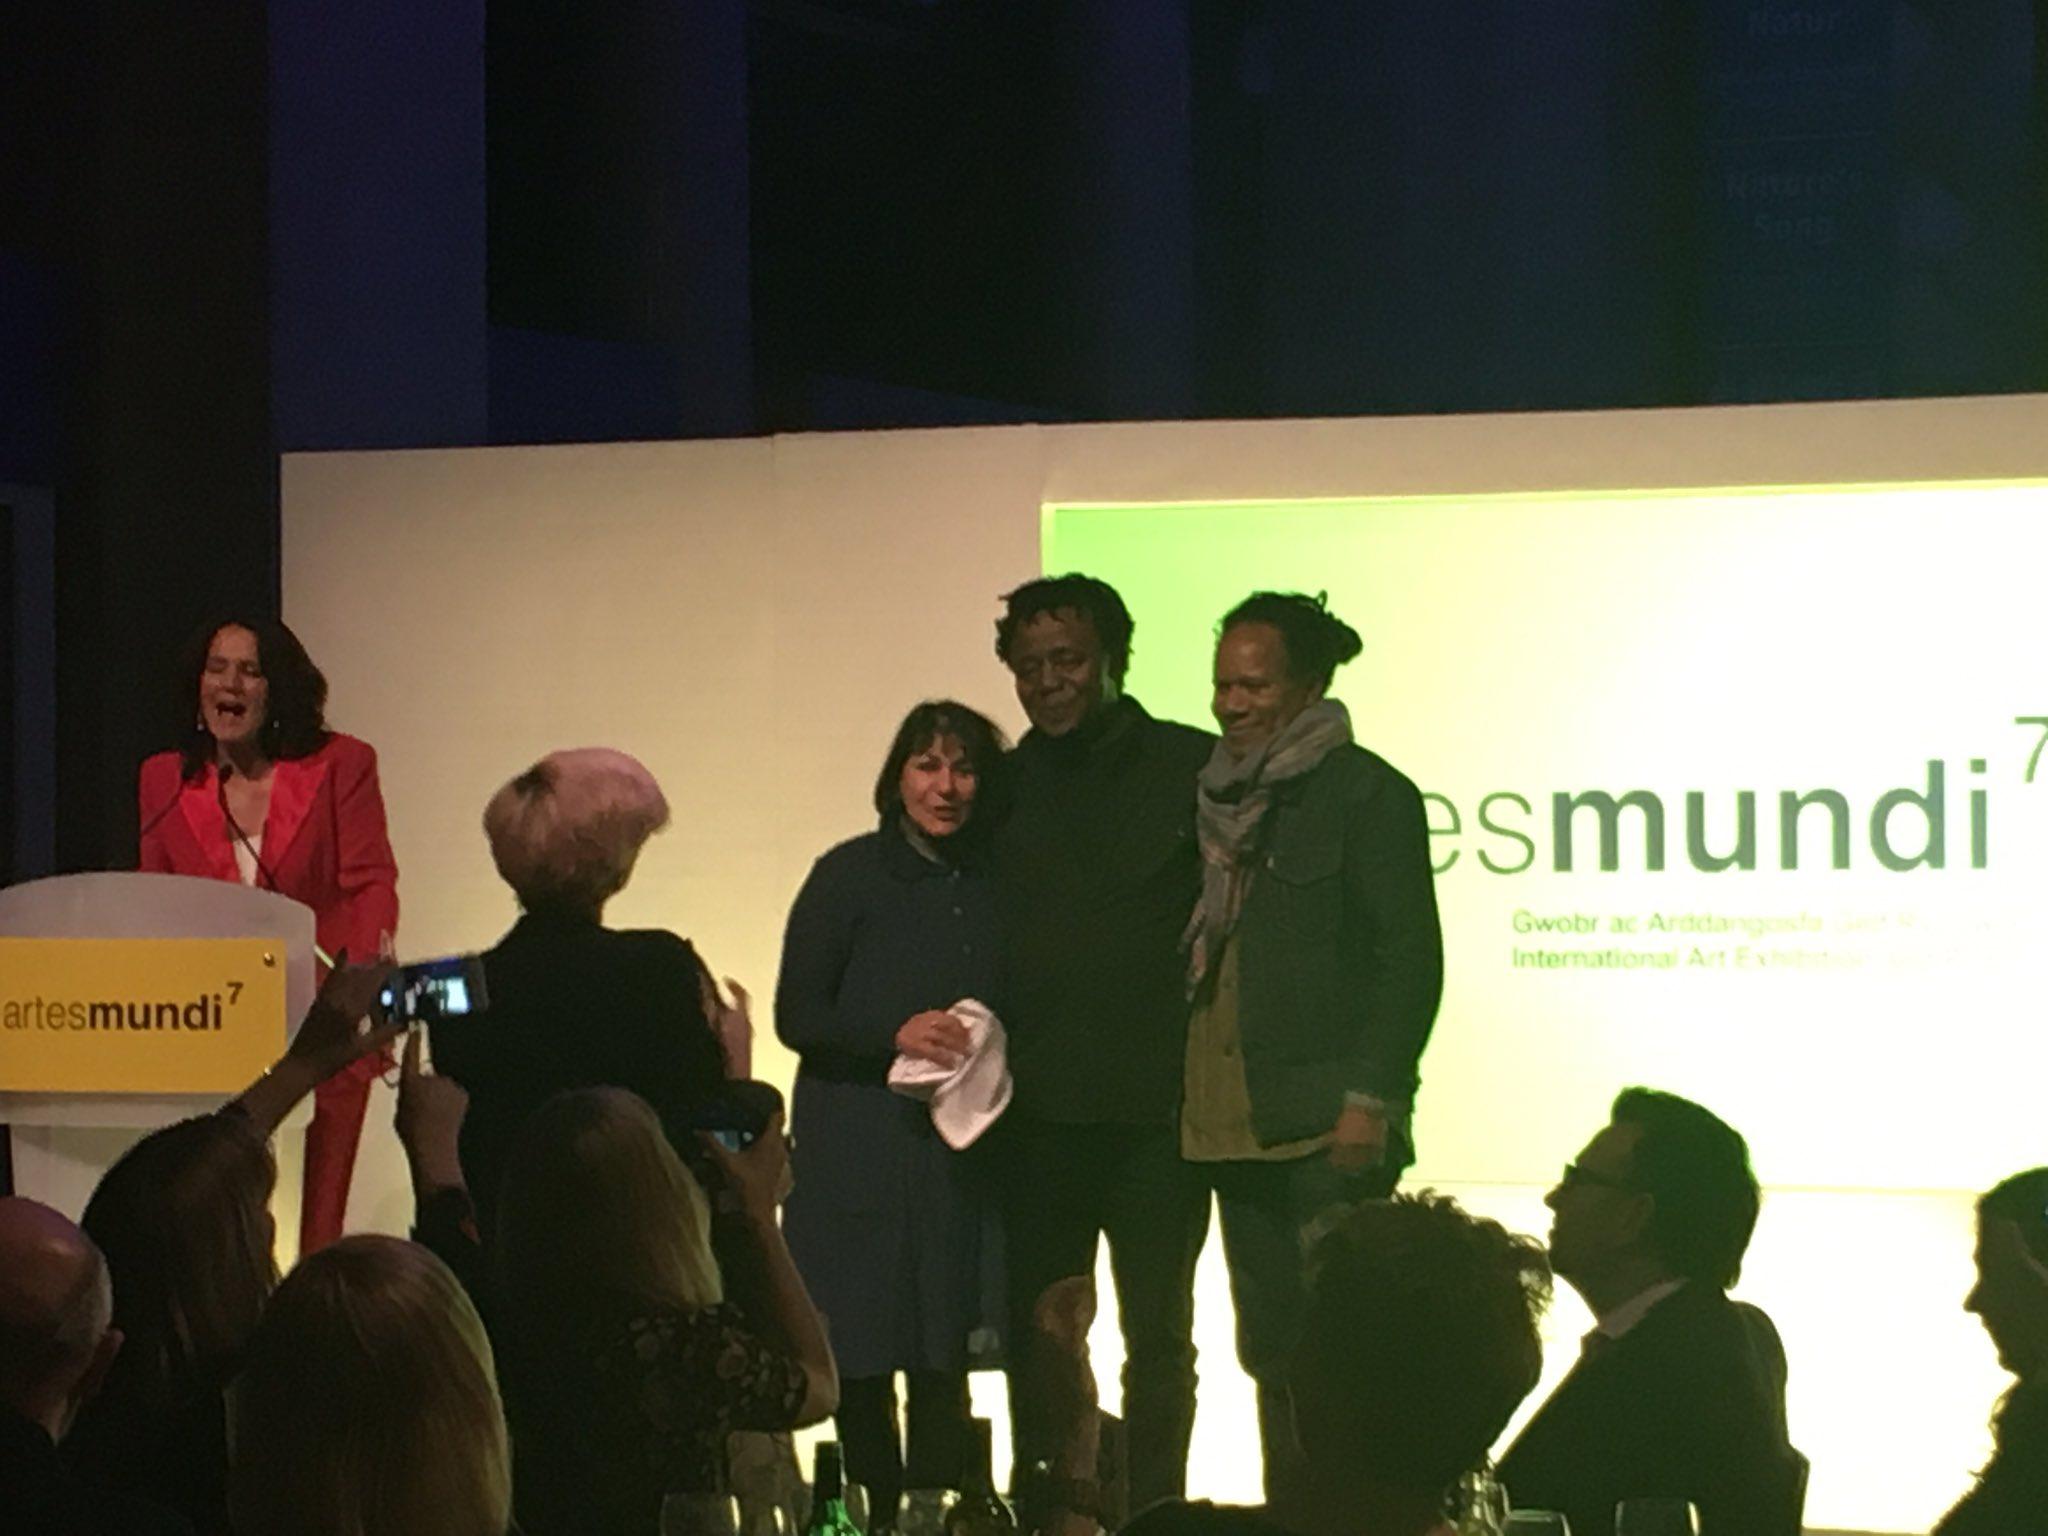 John Akomfrah is announced as the winner of #artesmundi7. Congratulations! https://t.co/v2aP0aKO9P https://t.co/YtLuXpLLT3